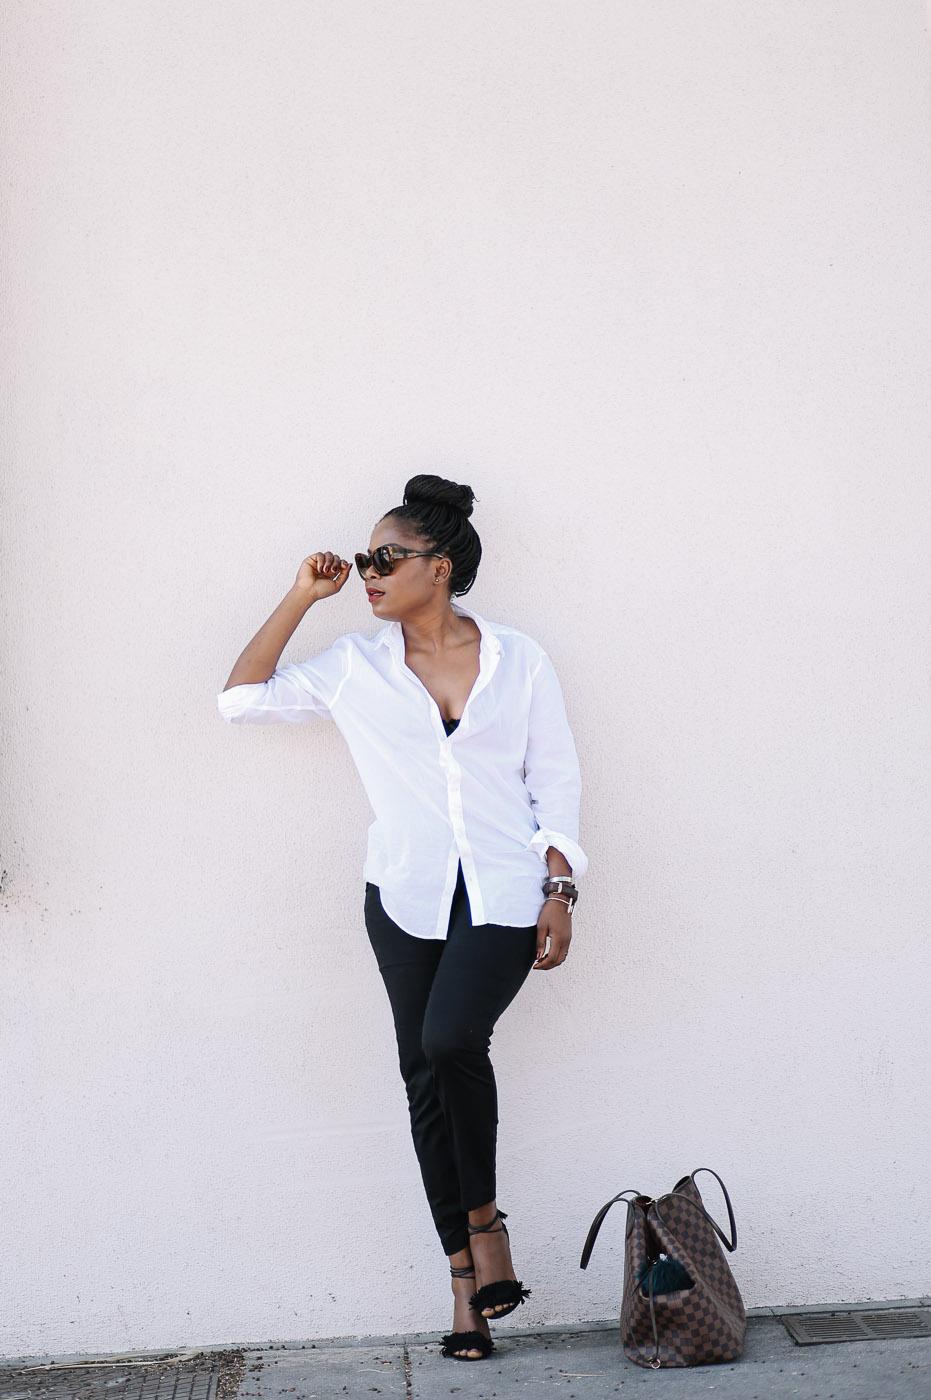 boyfriend shirt and Black slacks-4